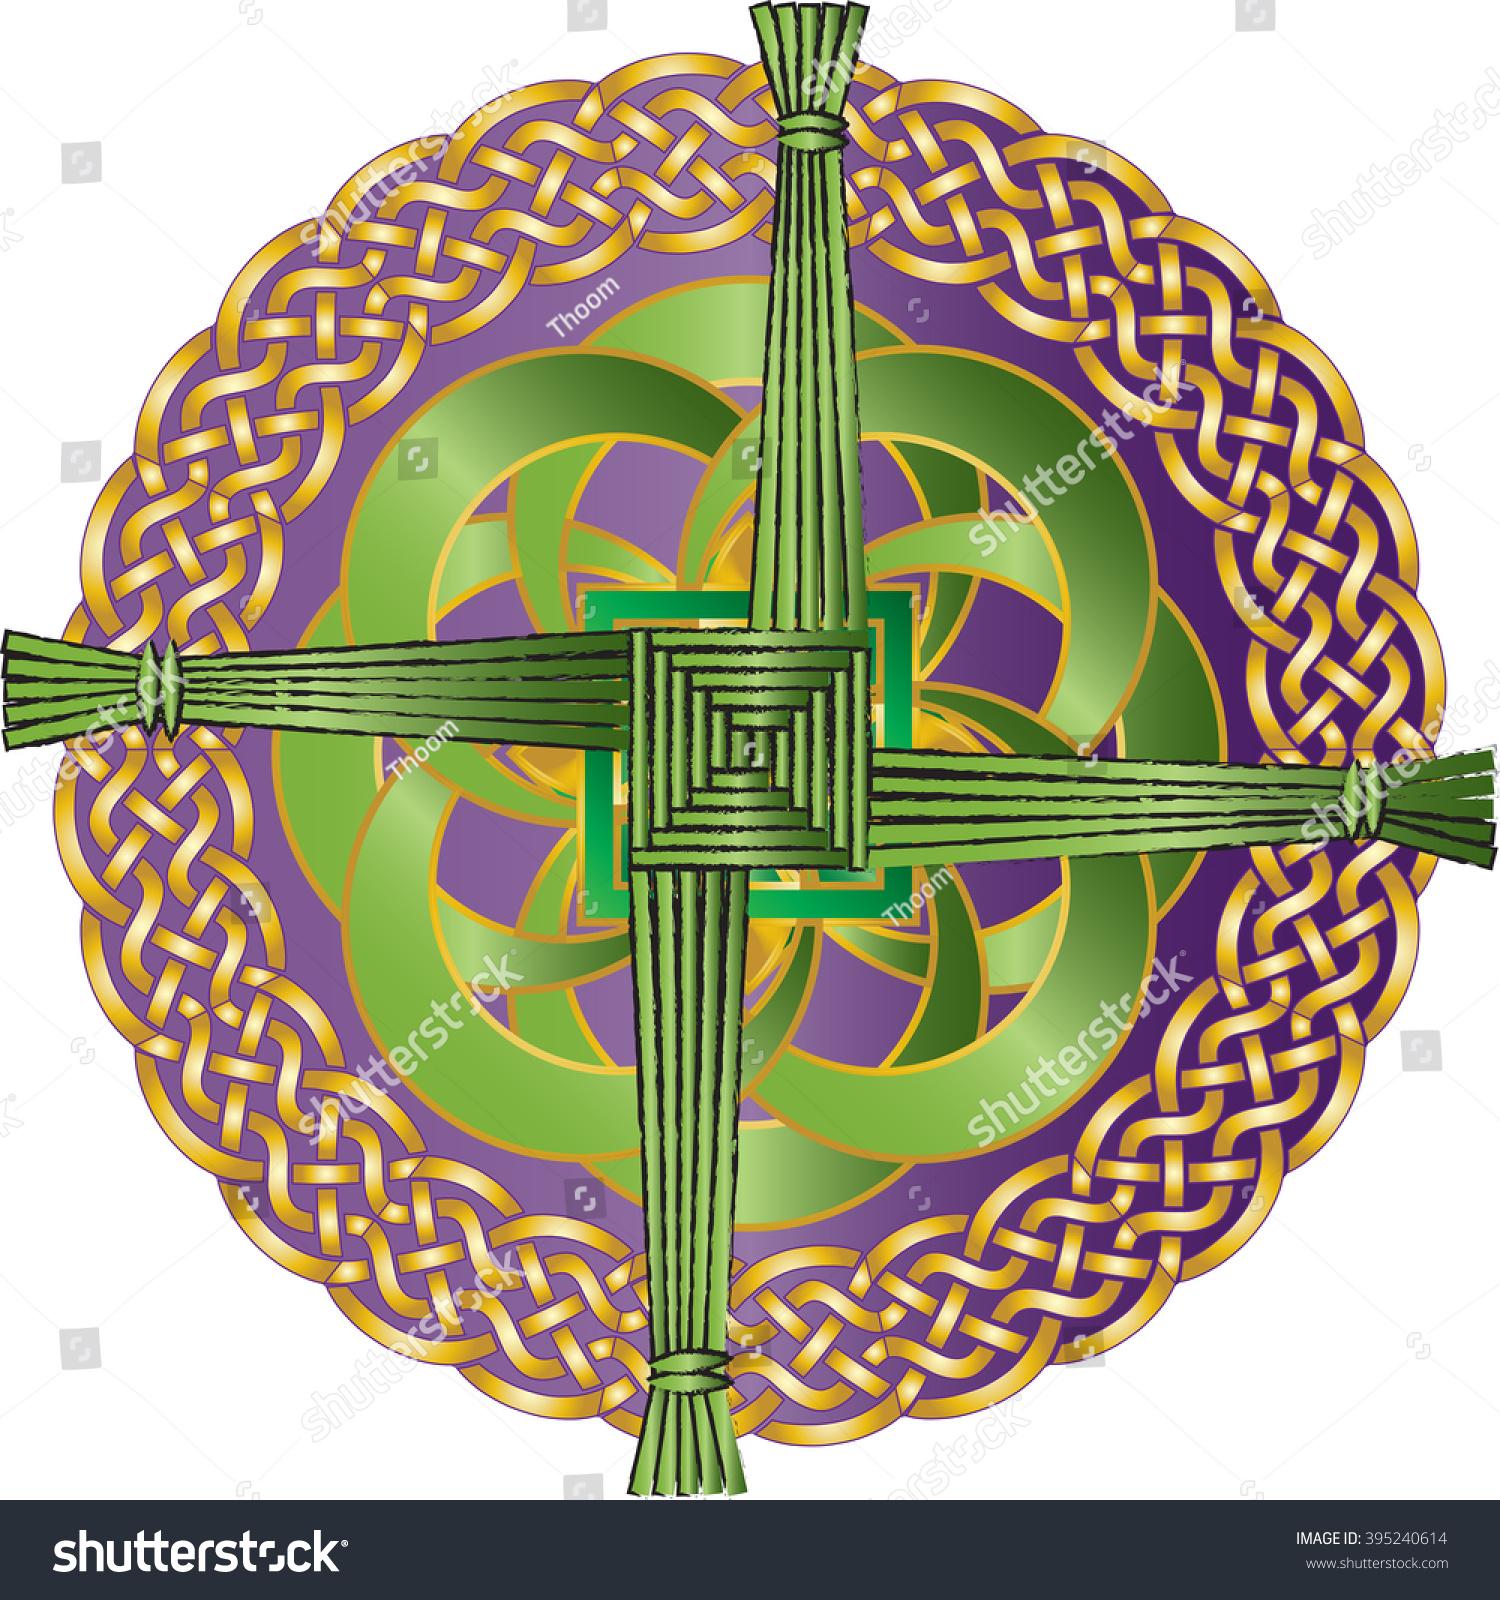 irish celtic knot ornament cross st stock illustration 395240614 shutterstock. Black Bedroom Furniture Sets. Home Design Ideas